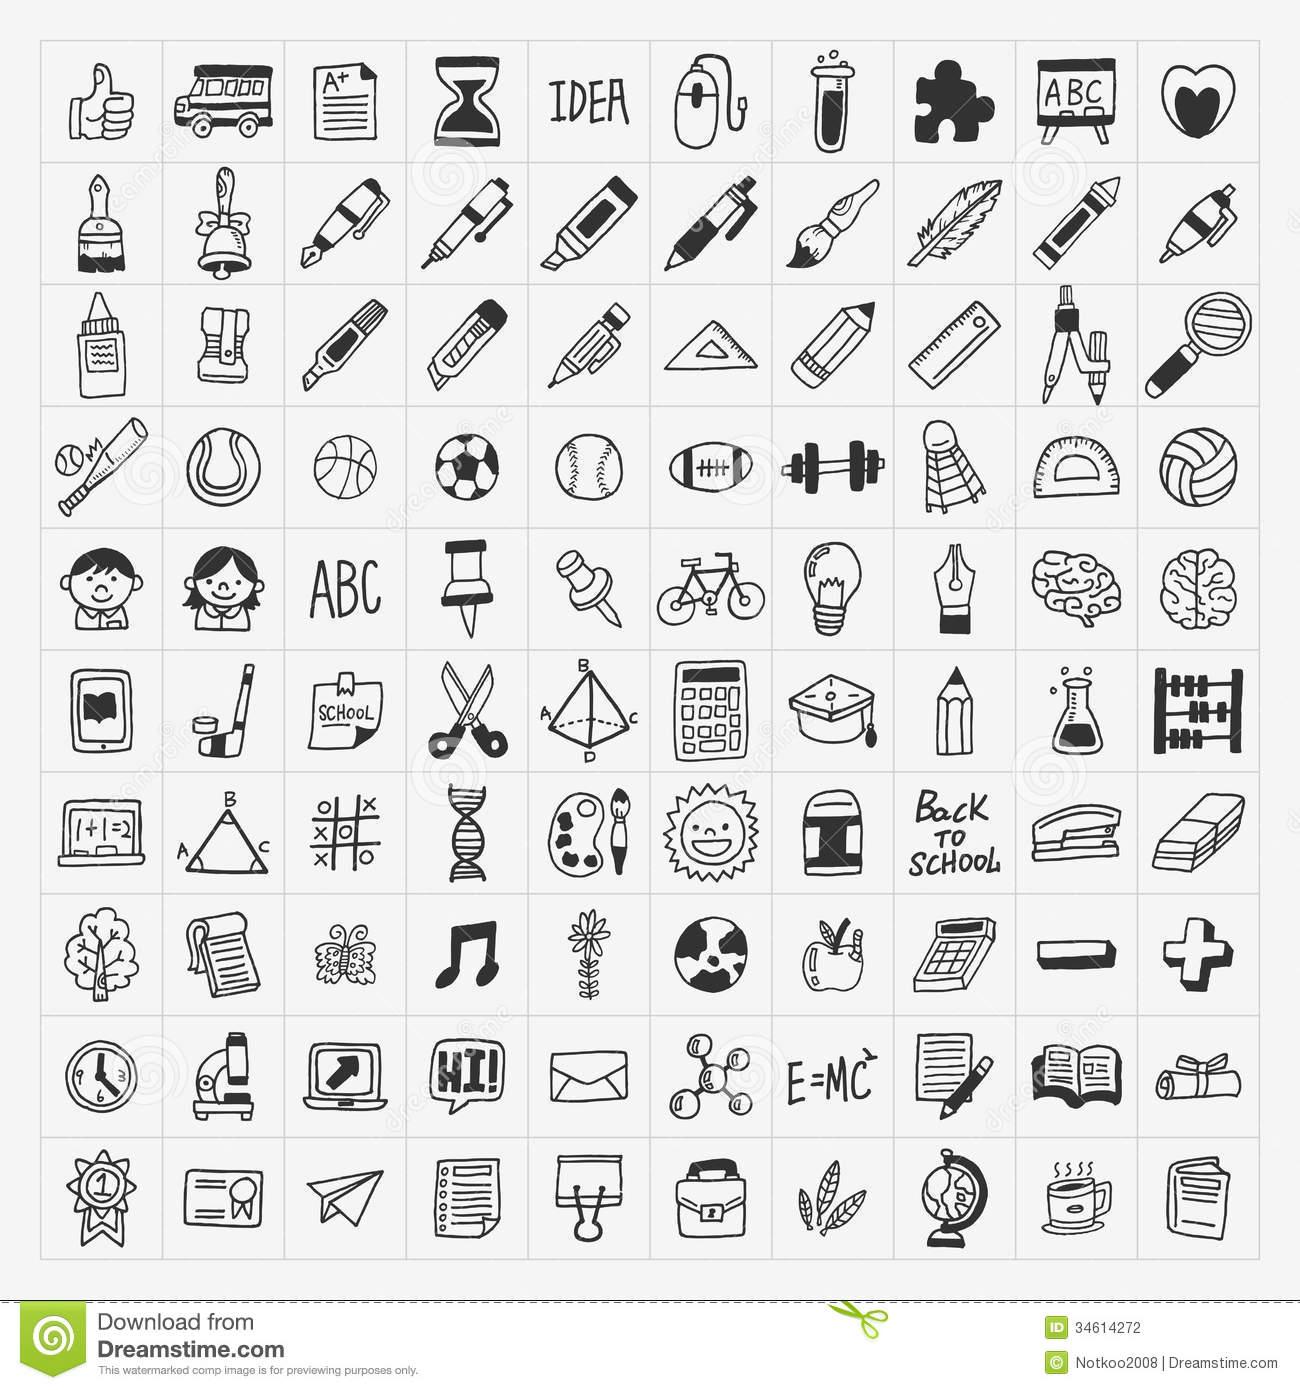 Drawn number doodle Doodles  Search doodles Google